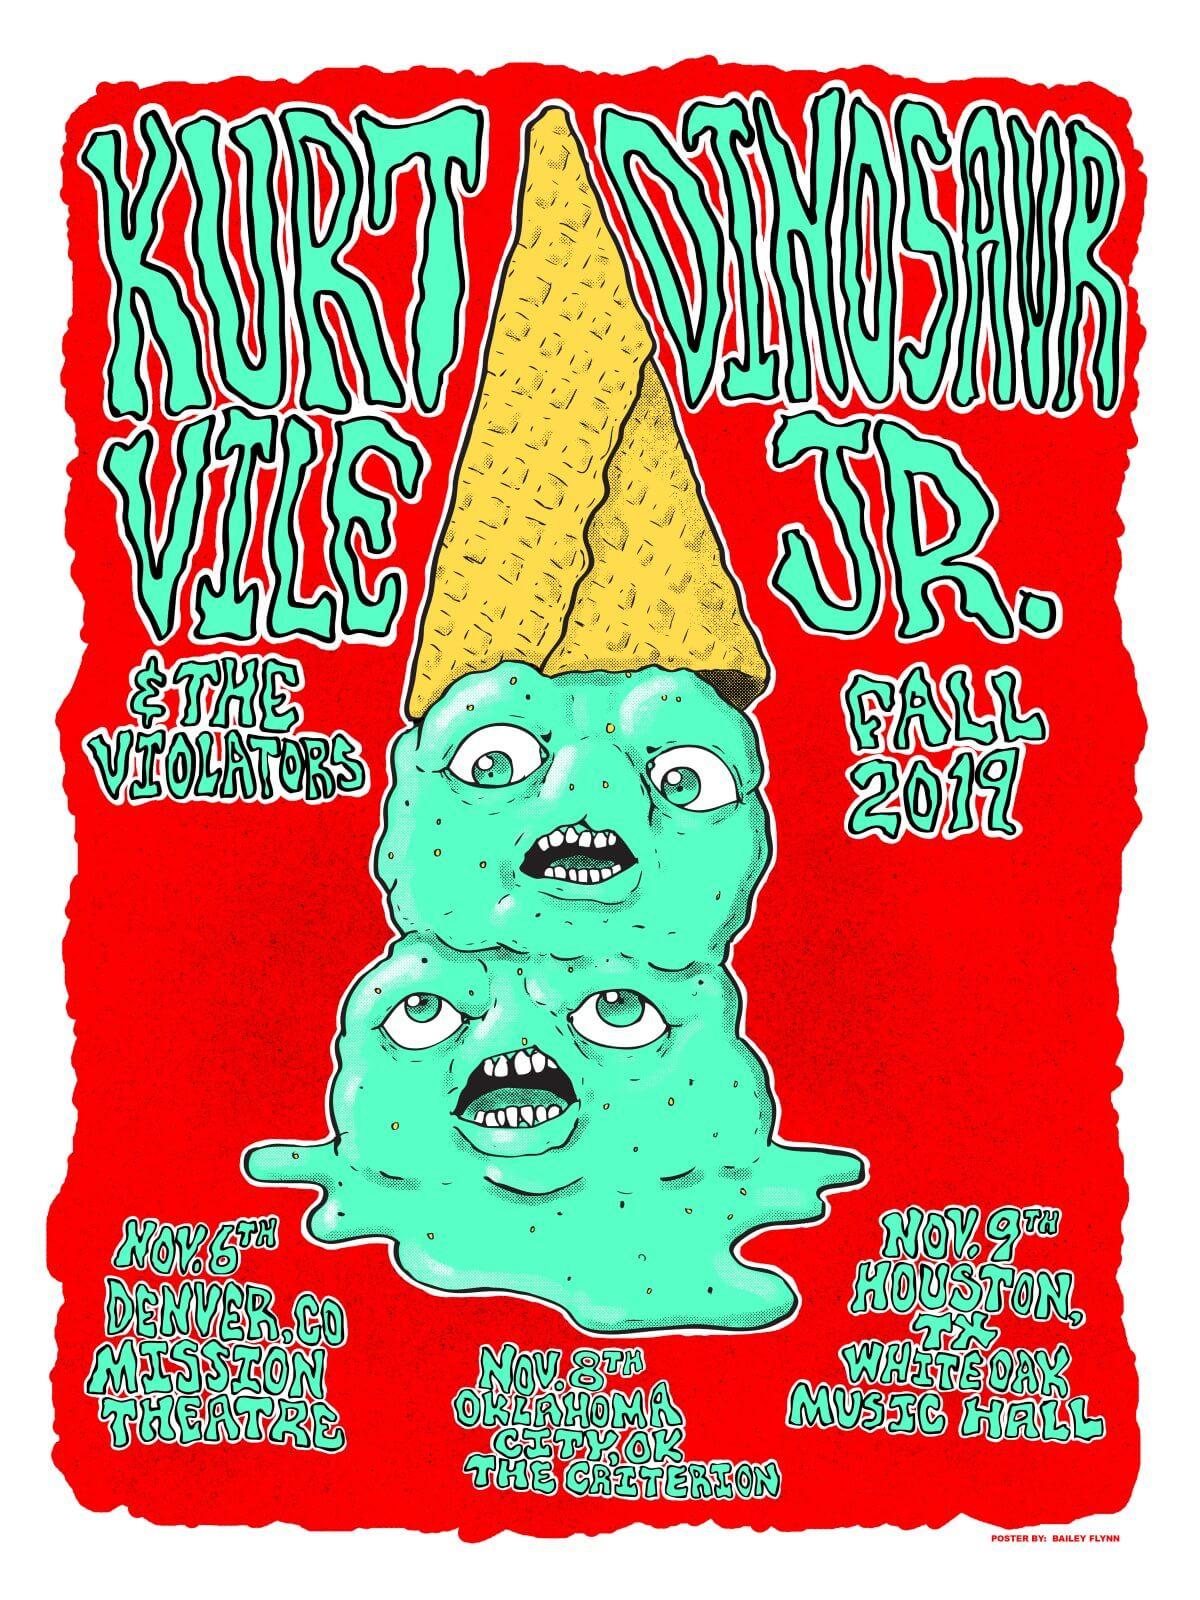 Kurt Vile & The Violators / Dinosaur Jr. Fall 2019 Tour